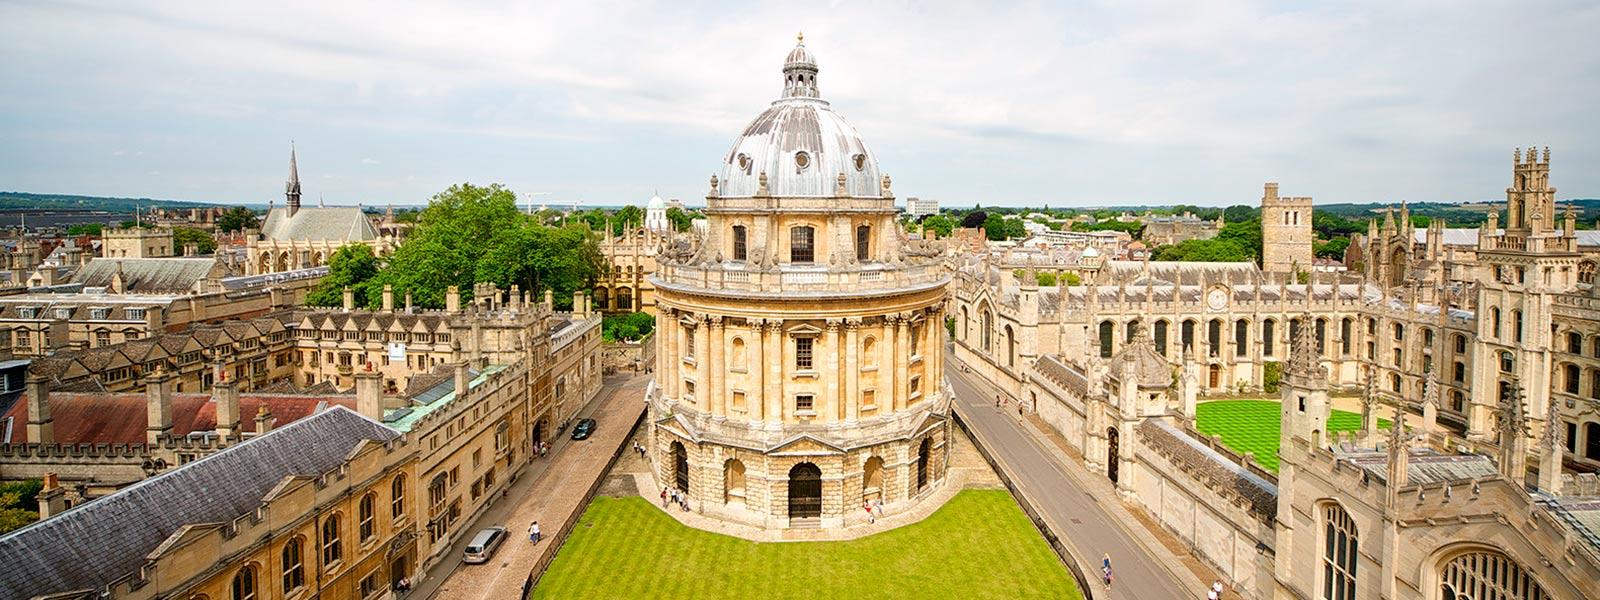 Cursos de inglés en Oxford 2017 – Curso de inglés en el extranjero